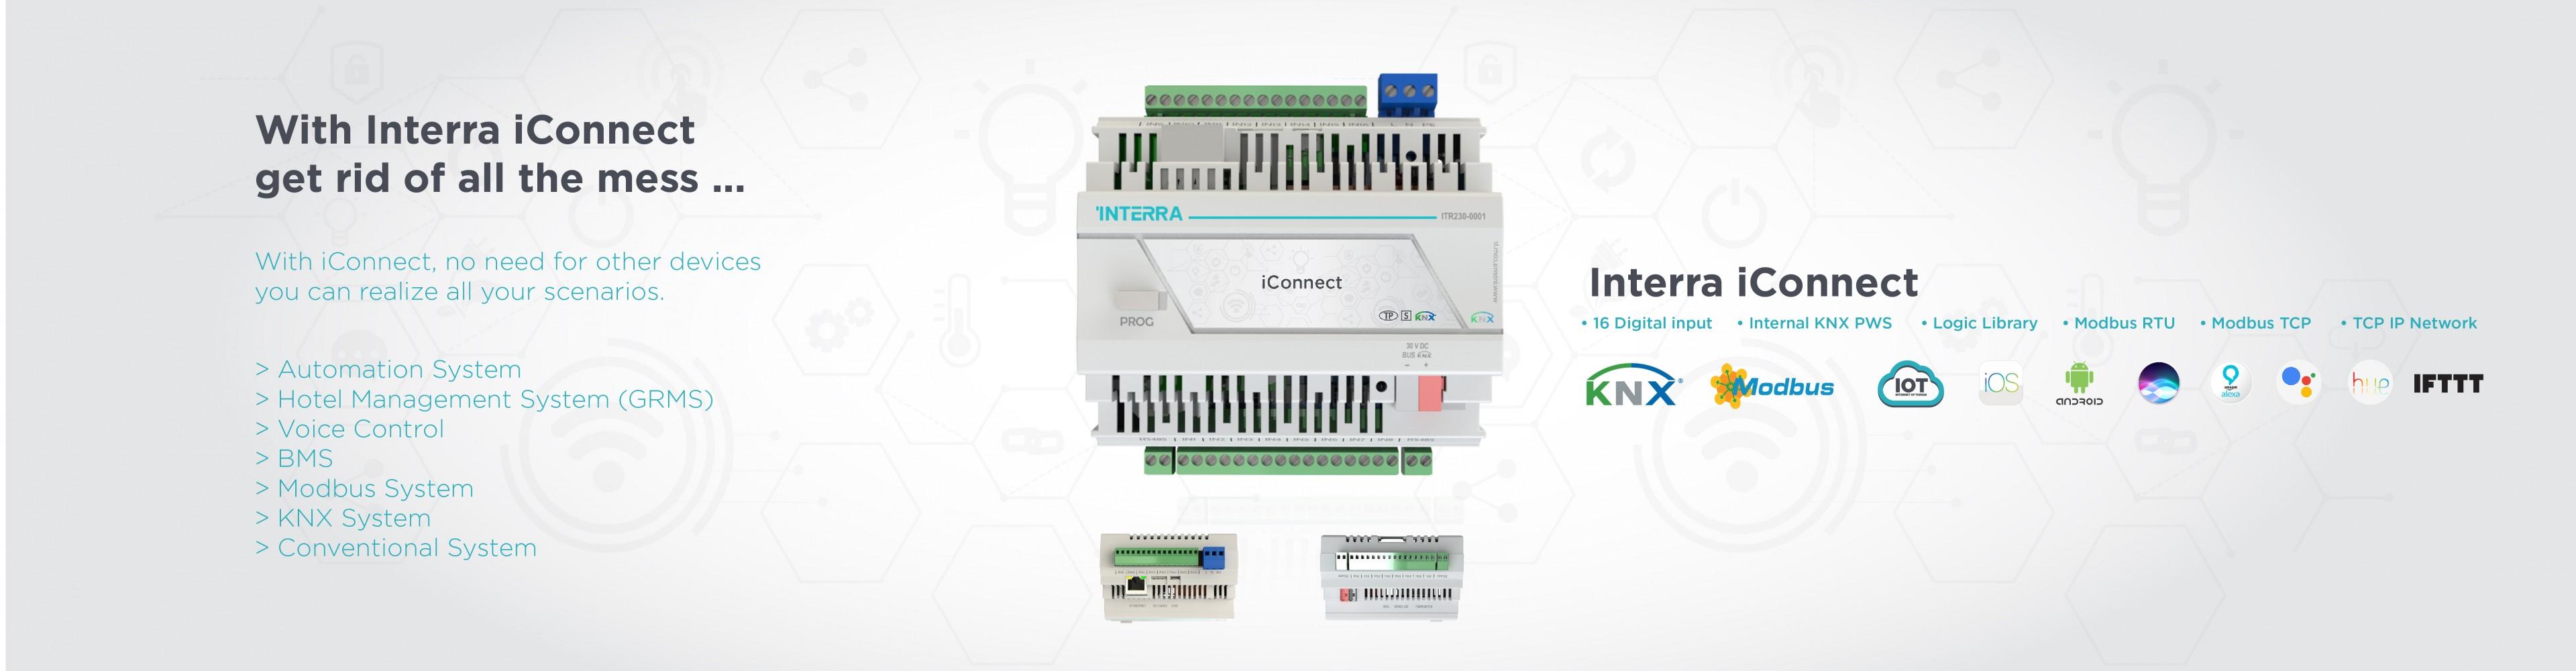 Iconnect Interra